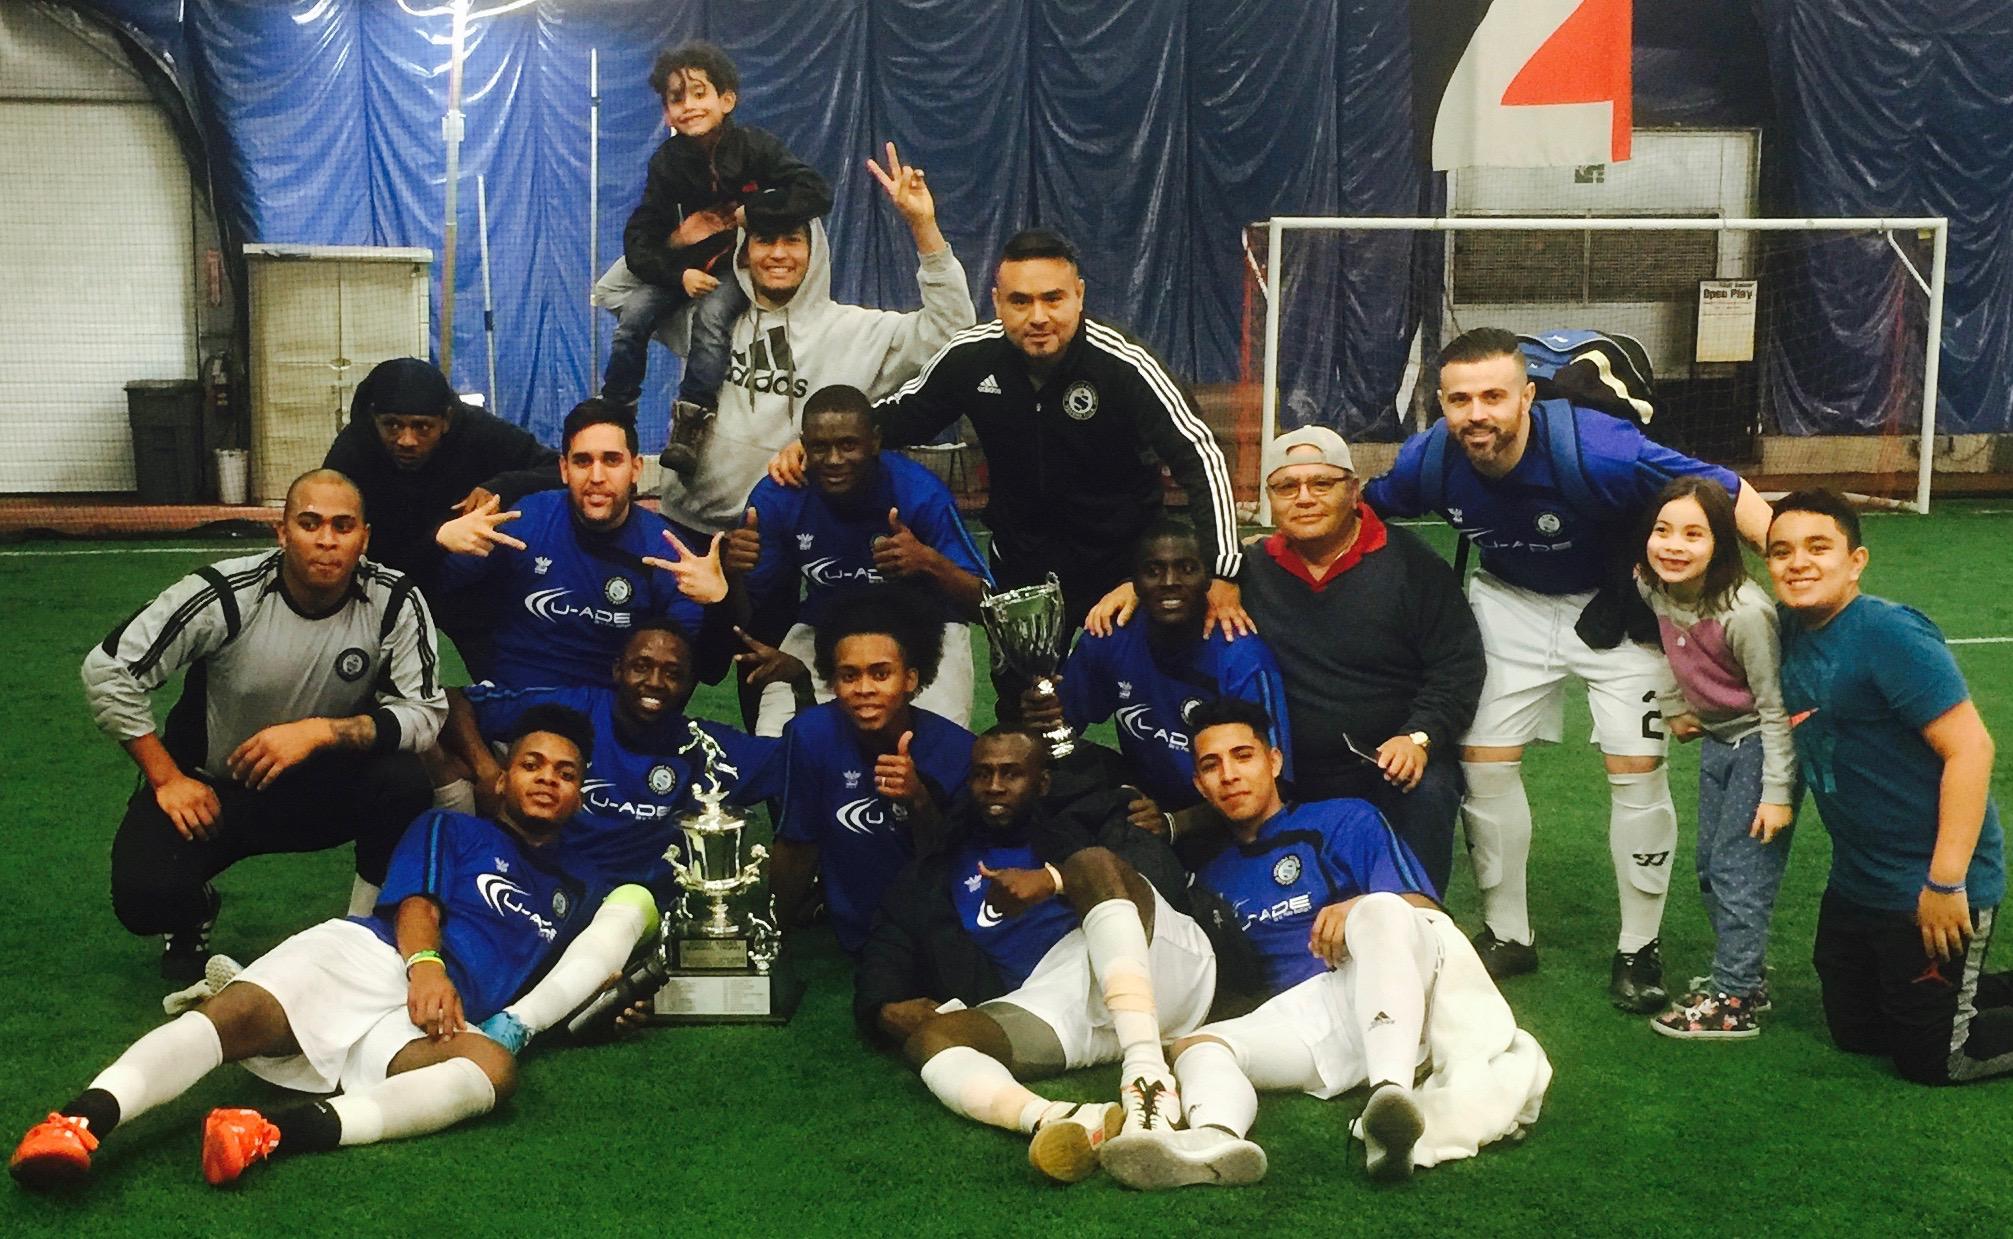 2016 Csl Indoor Soccer Tournament Champions